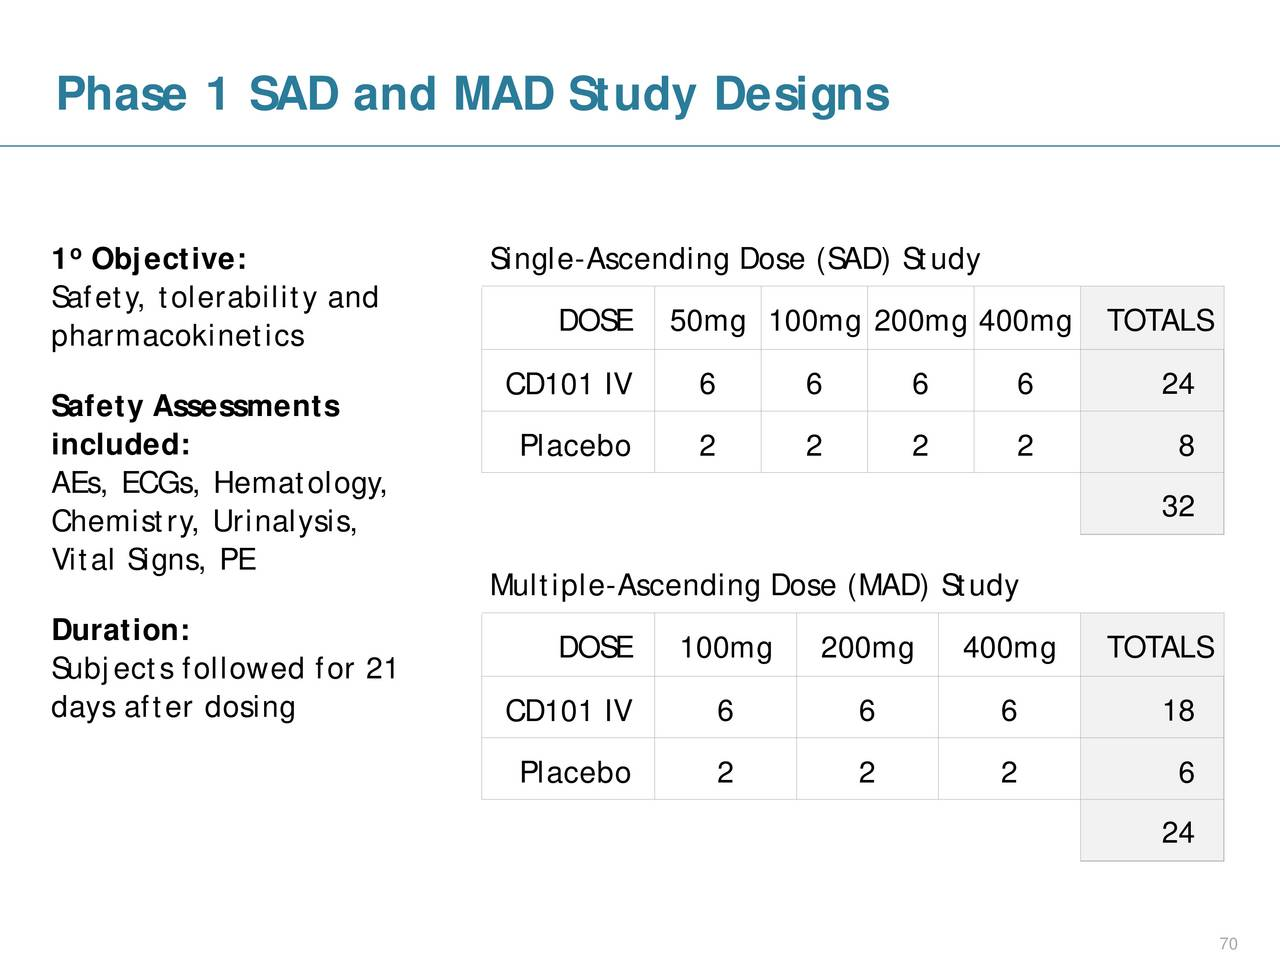 Multiple ascending dose study